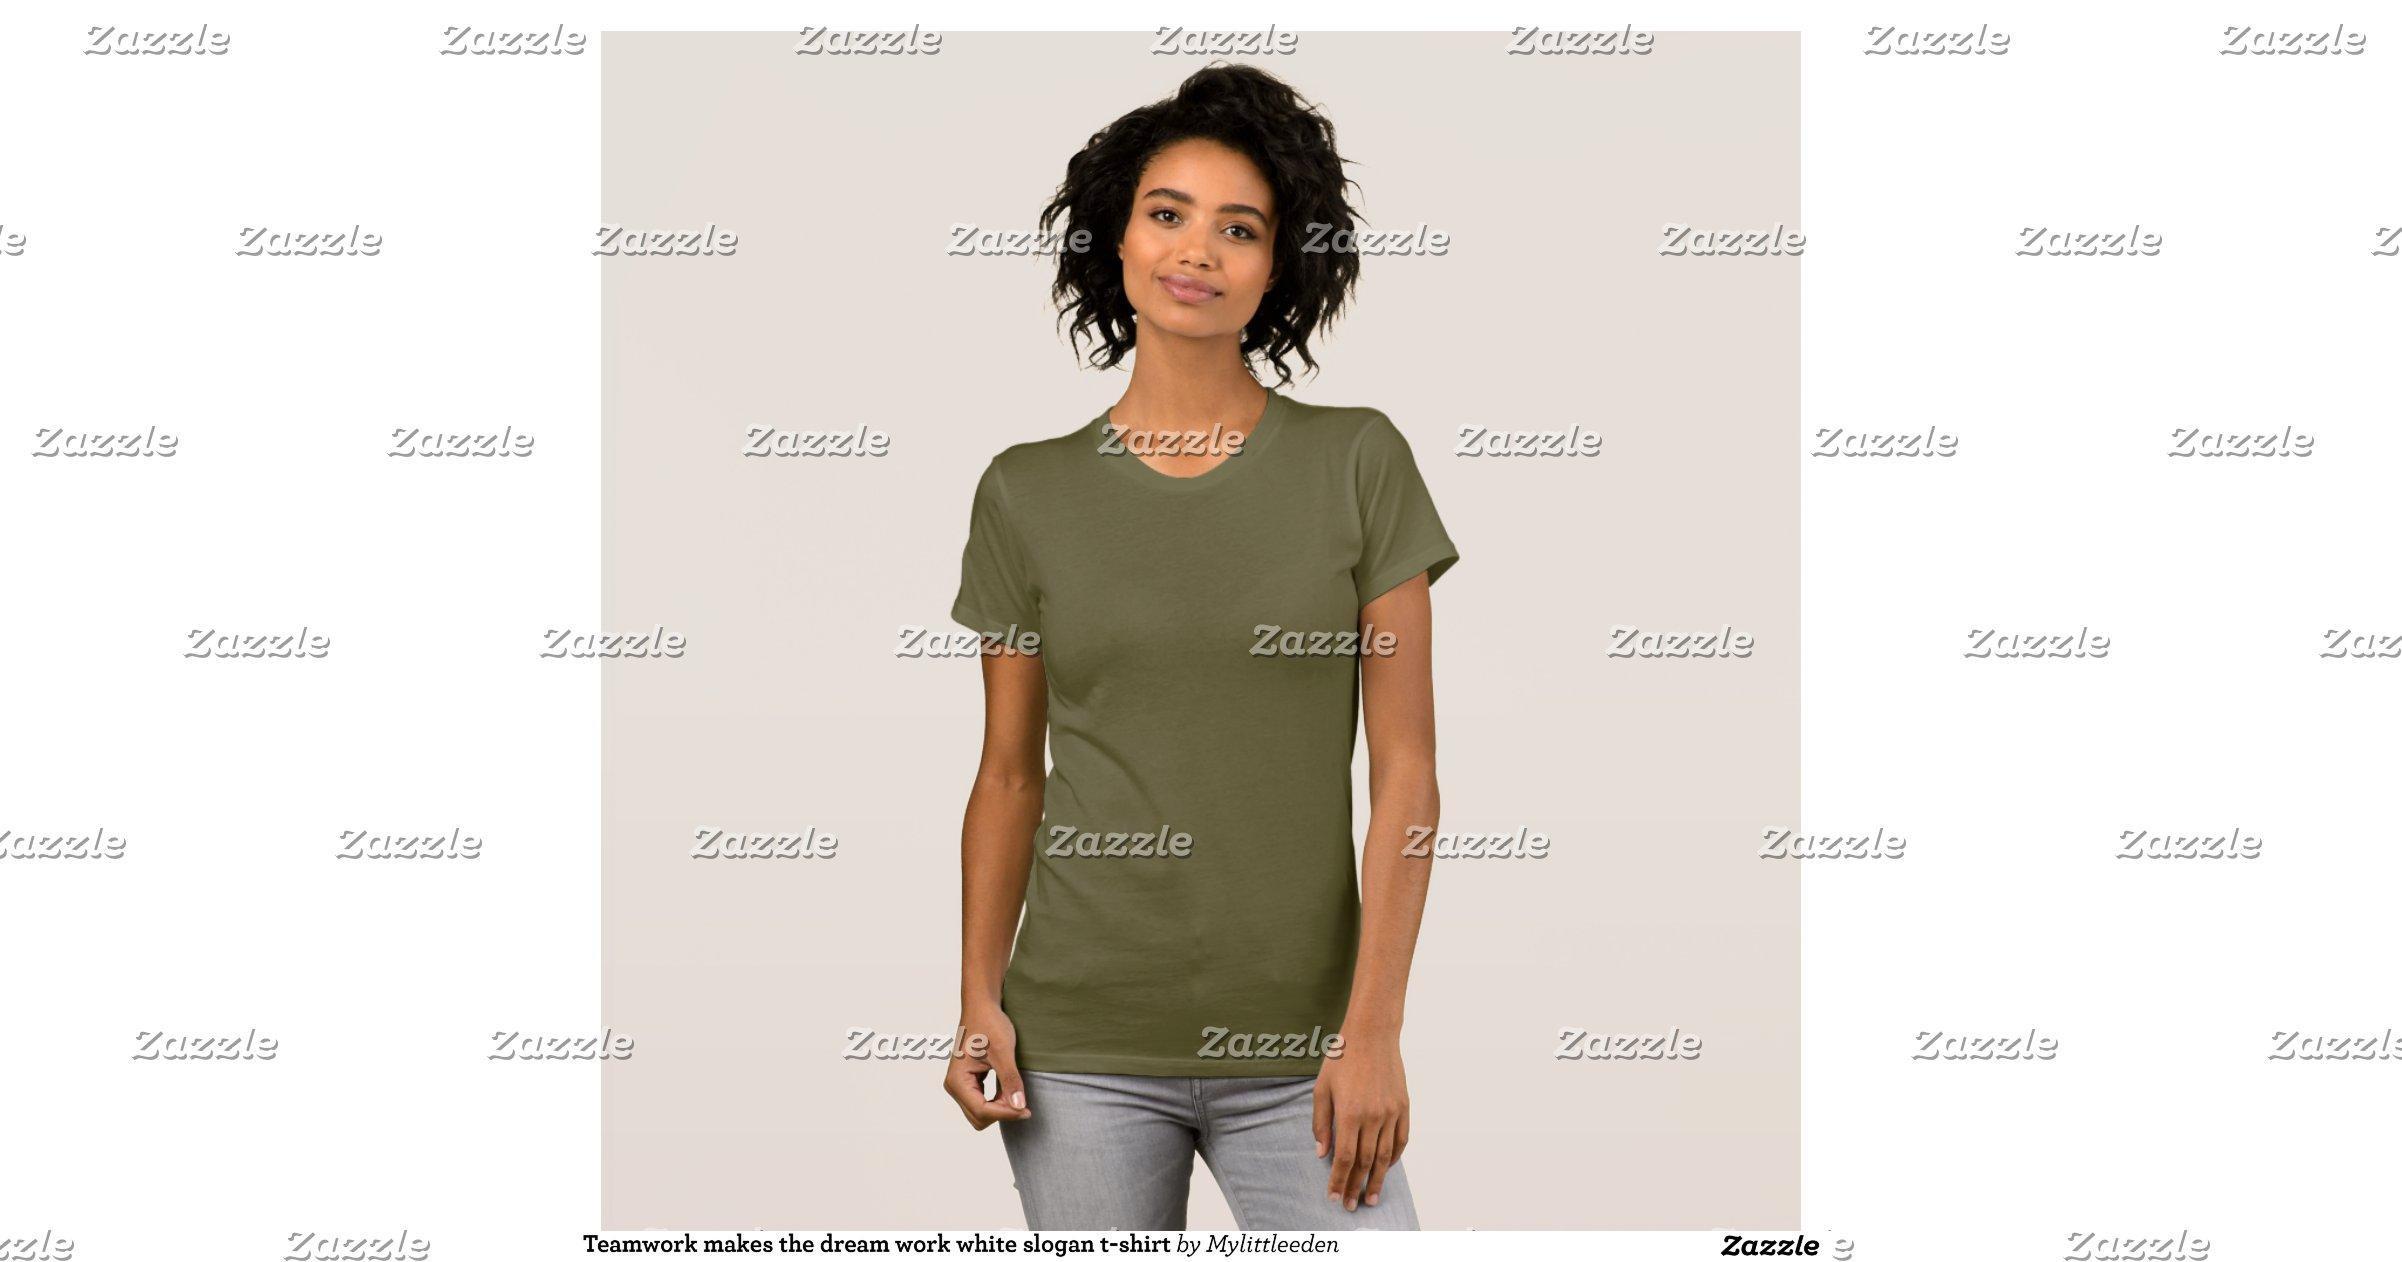 Teamwork makes the dream work white slogan t-shirt | Zazzle